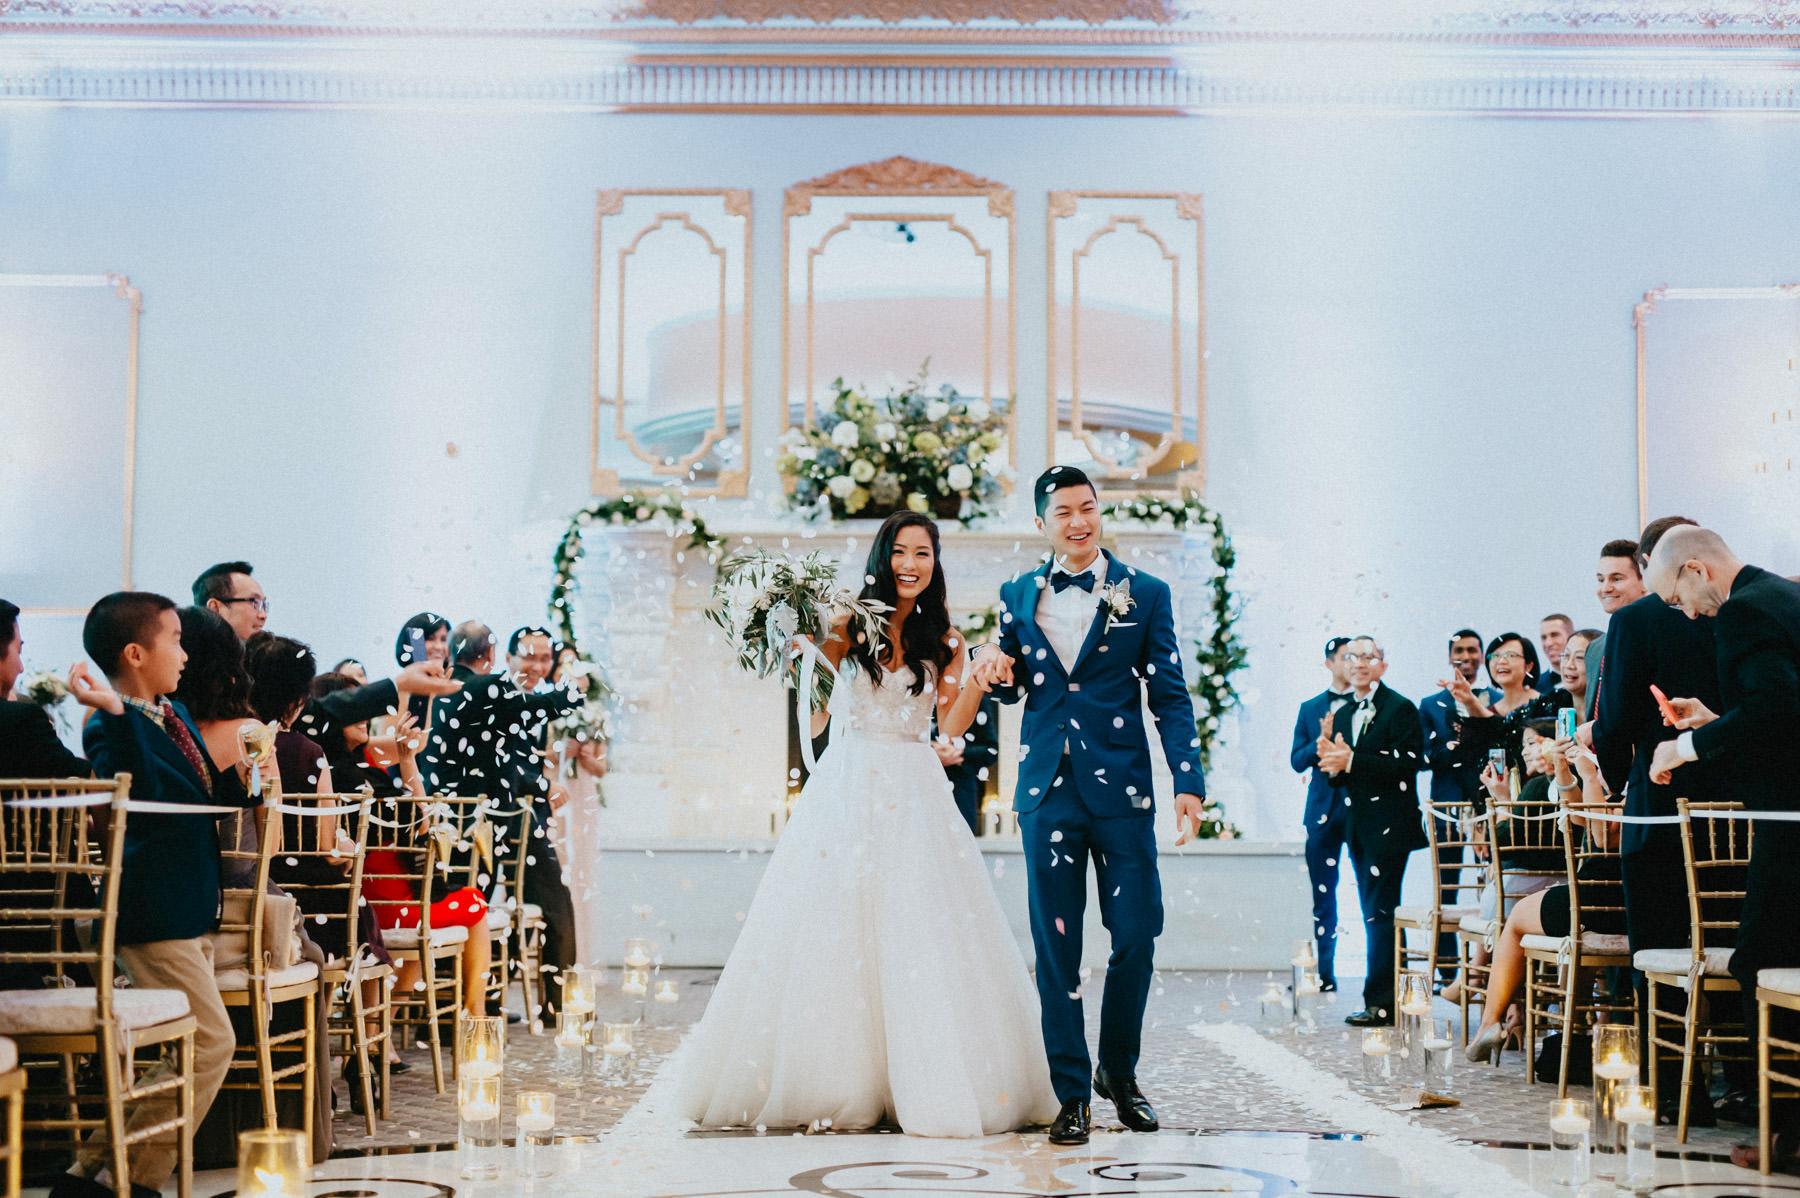 015-stylish-philadelphia-wedding-20.jpg